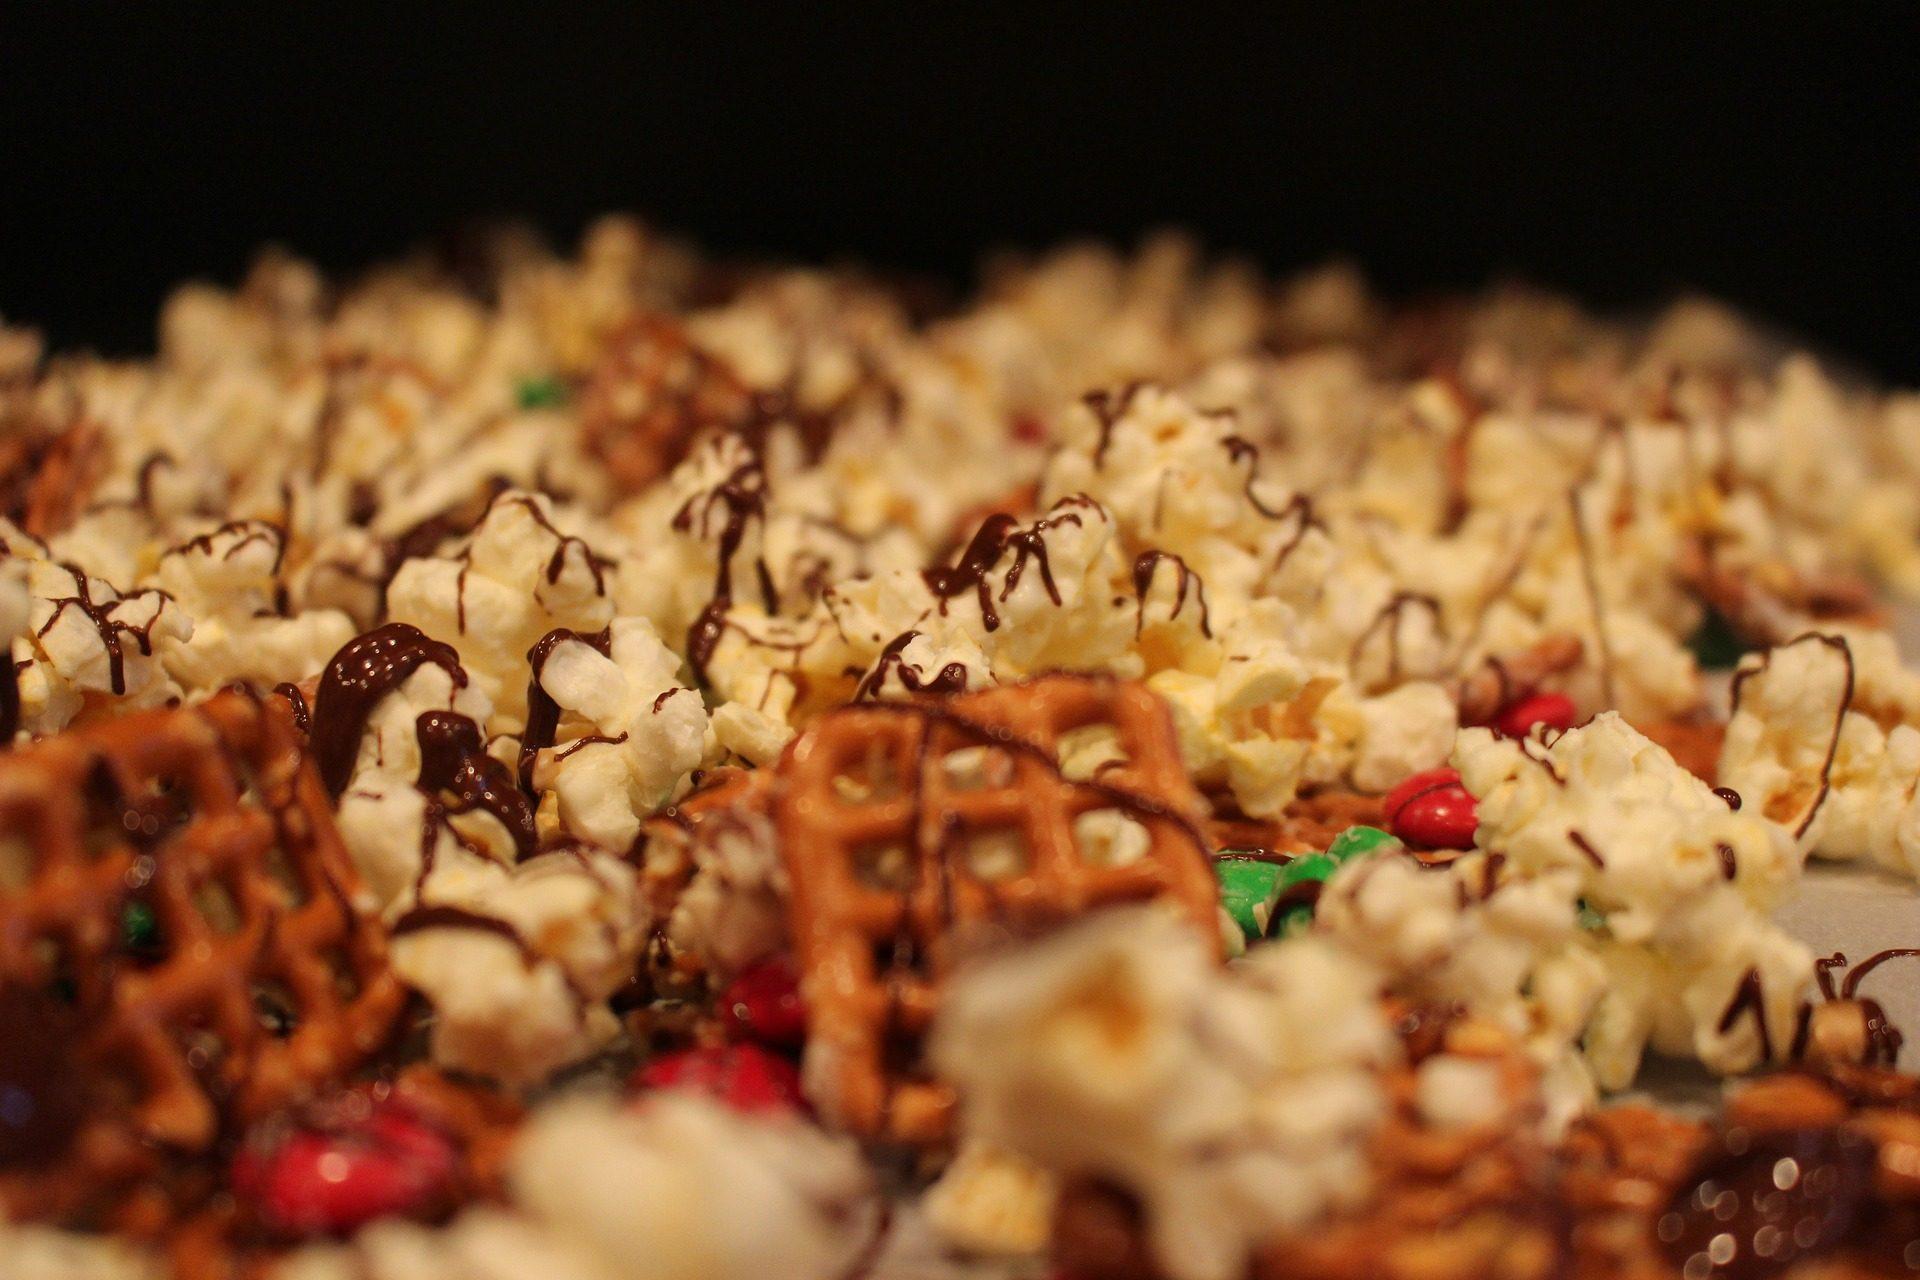 palomitas, कैंडी, प्यारा, चॉकलेट, pretzels, snack - HD वॉलपेपर - प्रोफेसर-falken.com